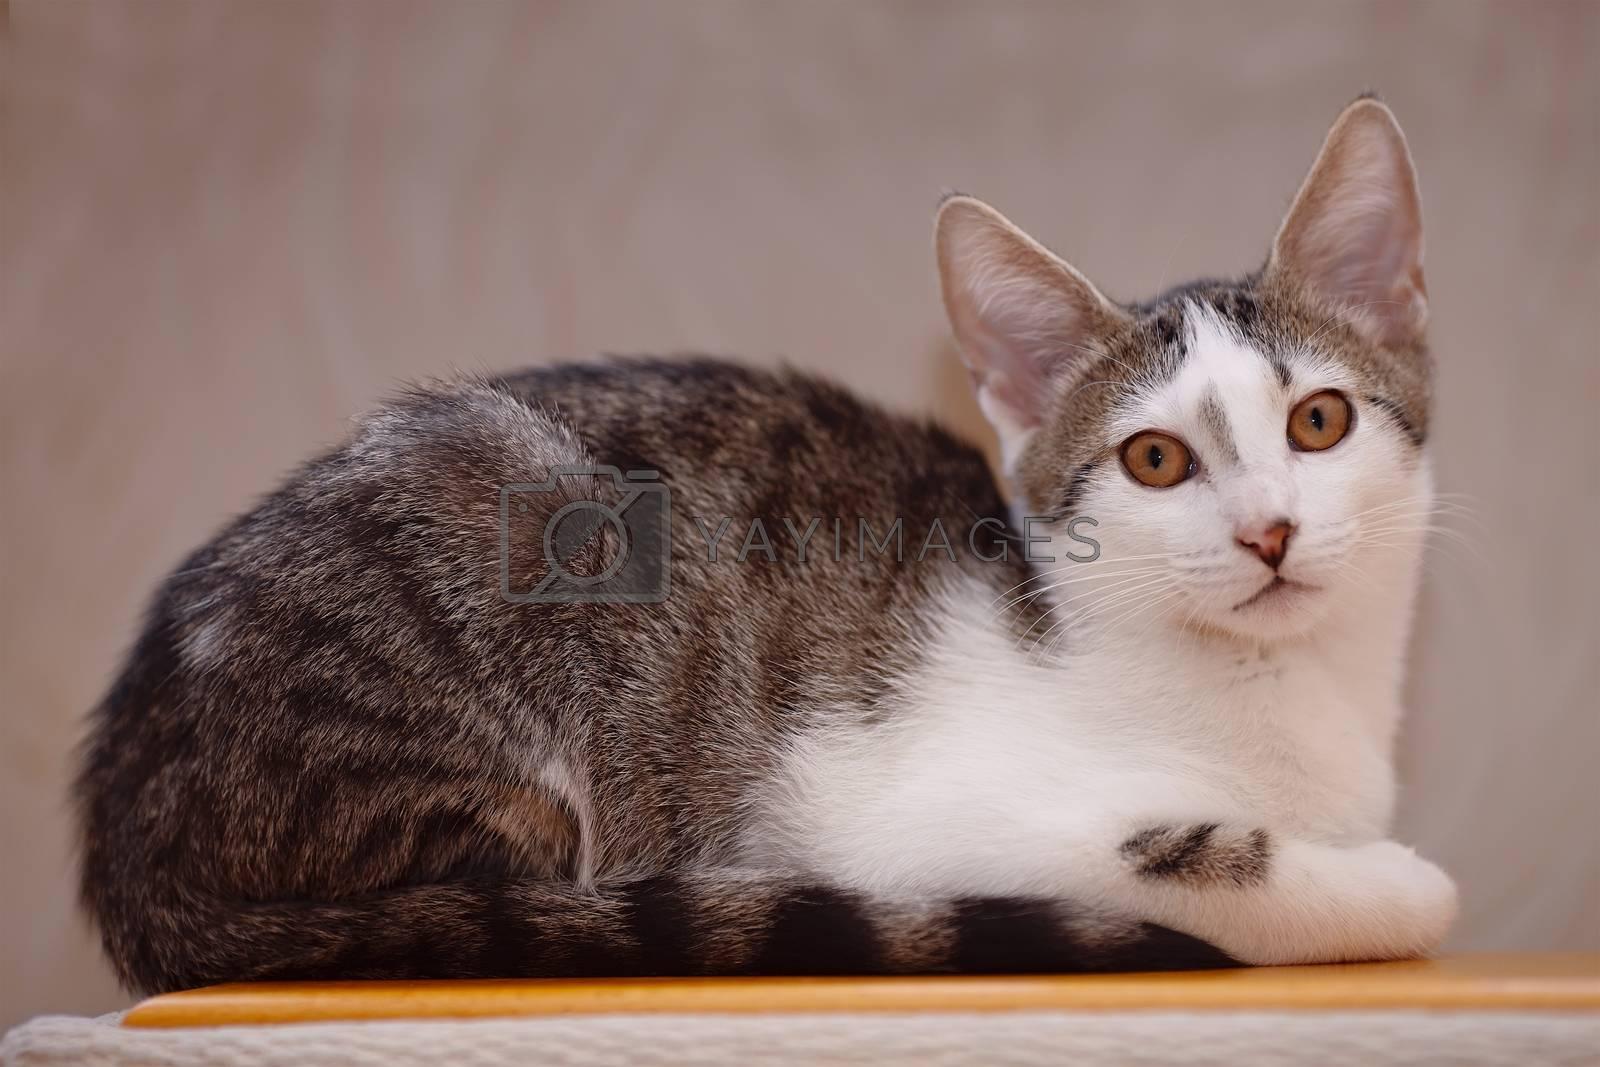 Royalty free image of Kitten on a sofa. by Azaliya